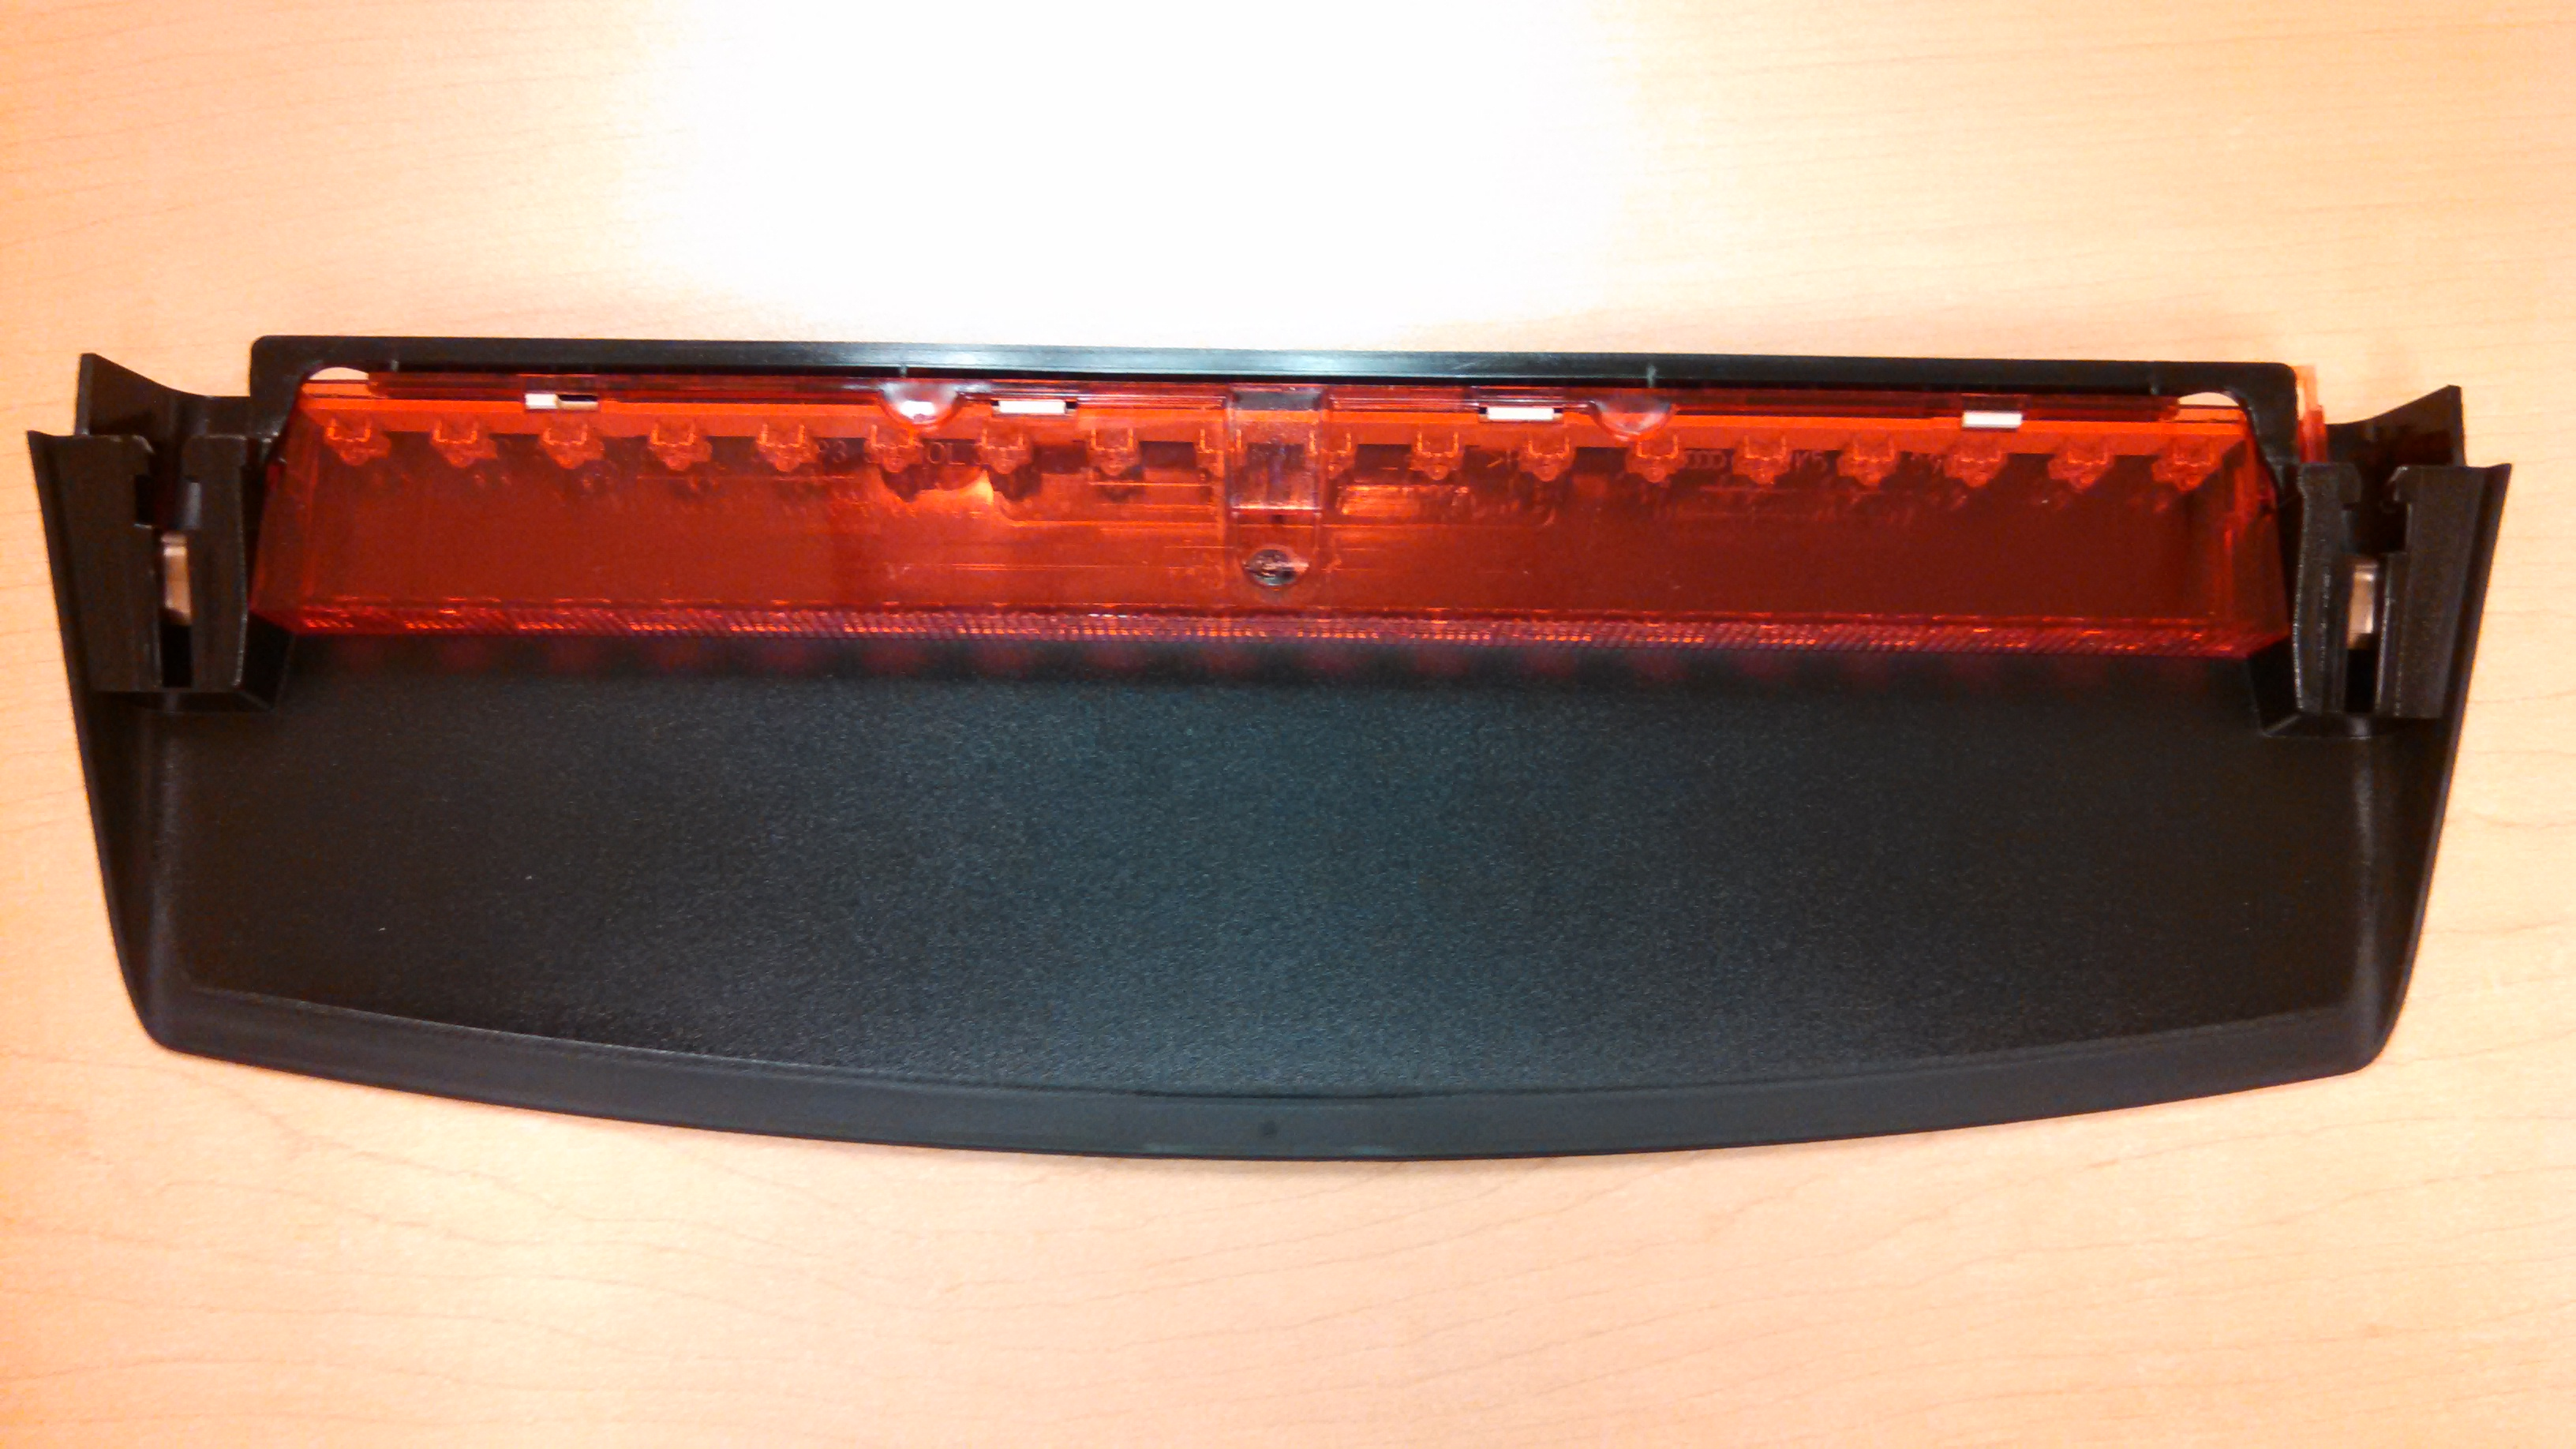 audi oem 09 16 a4 quattro 3rd third brake light lamp 8k5945097. Black Bedroom Furniture Sets. Home Design Ideas